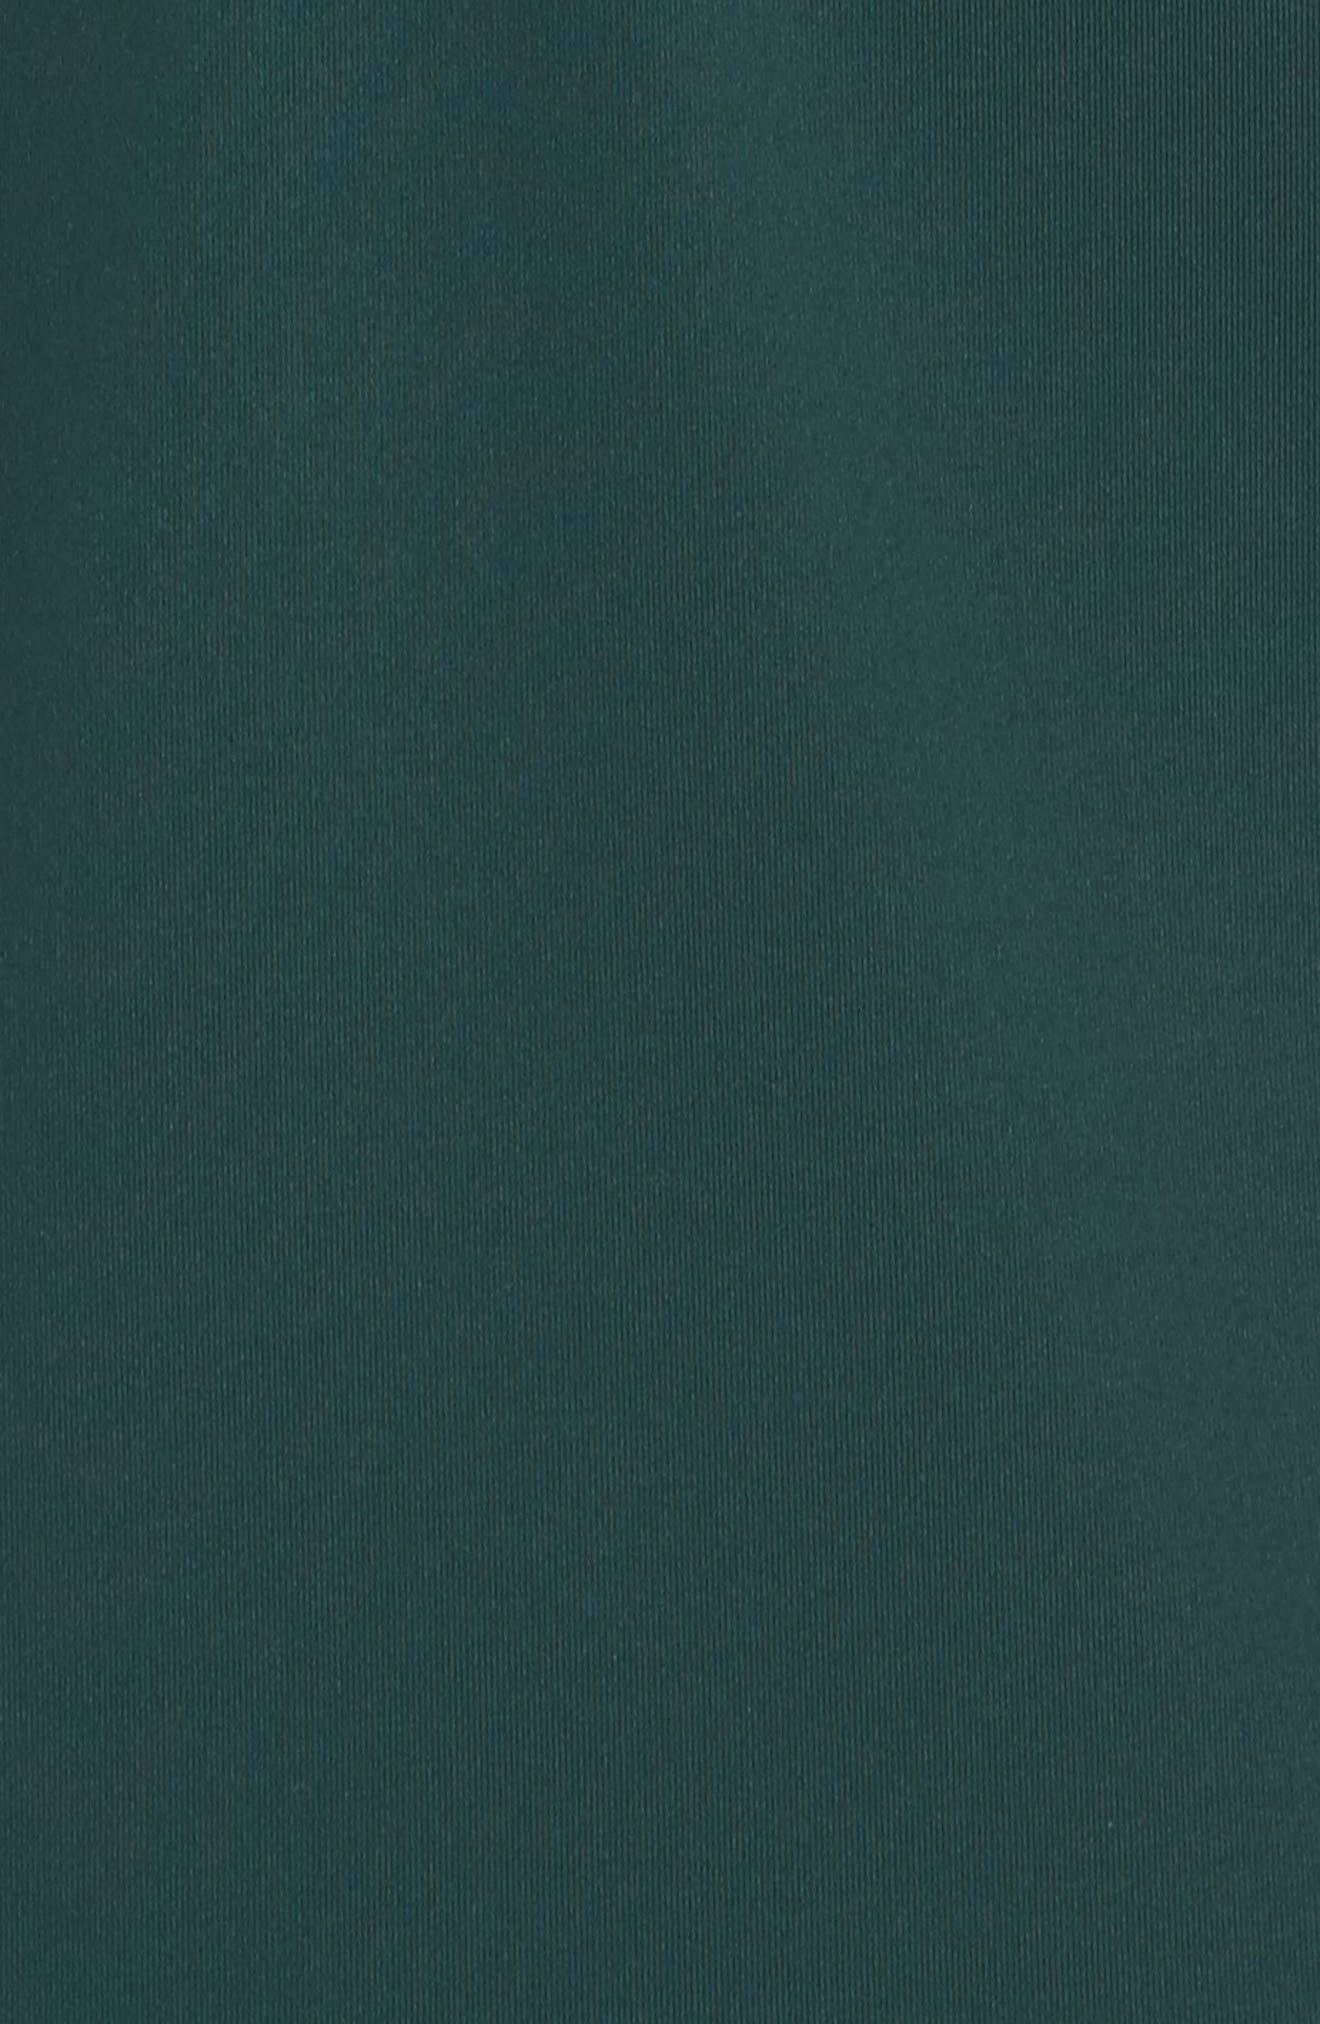 Island Goddess Lingerie Tankini Top,                             Alternate thumbnail 5, color,                             301